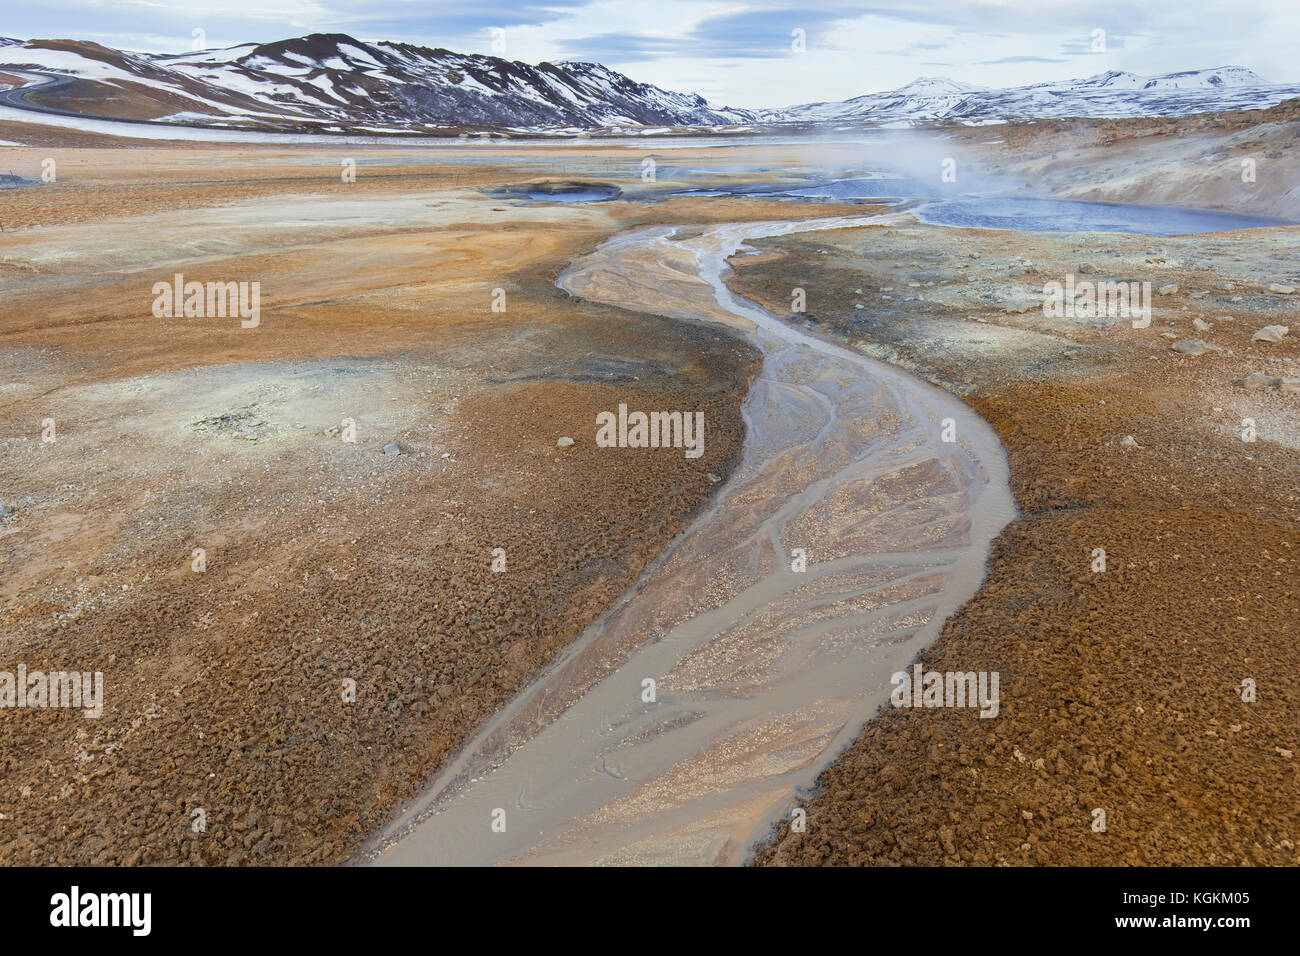 Hverir, área geotérmica cerca de Námafjall, Norðurland eystra / Nordurland eystra, Islandia Foto de stock